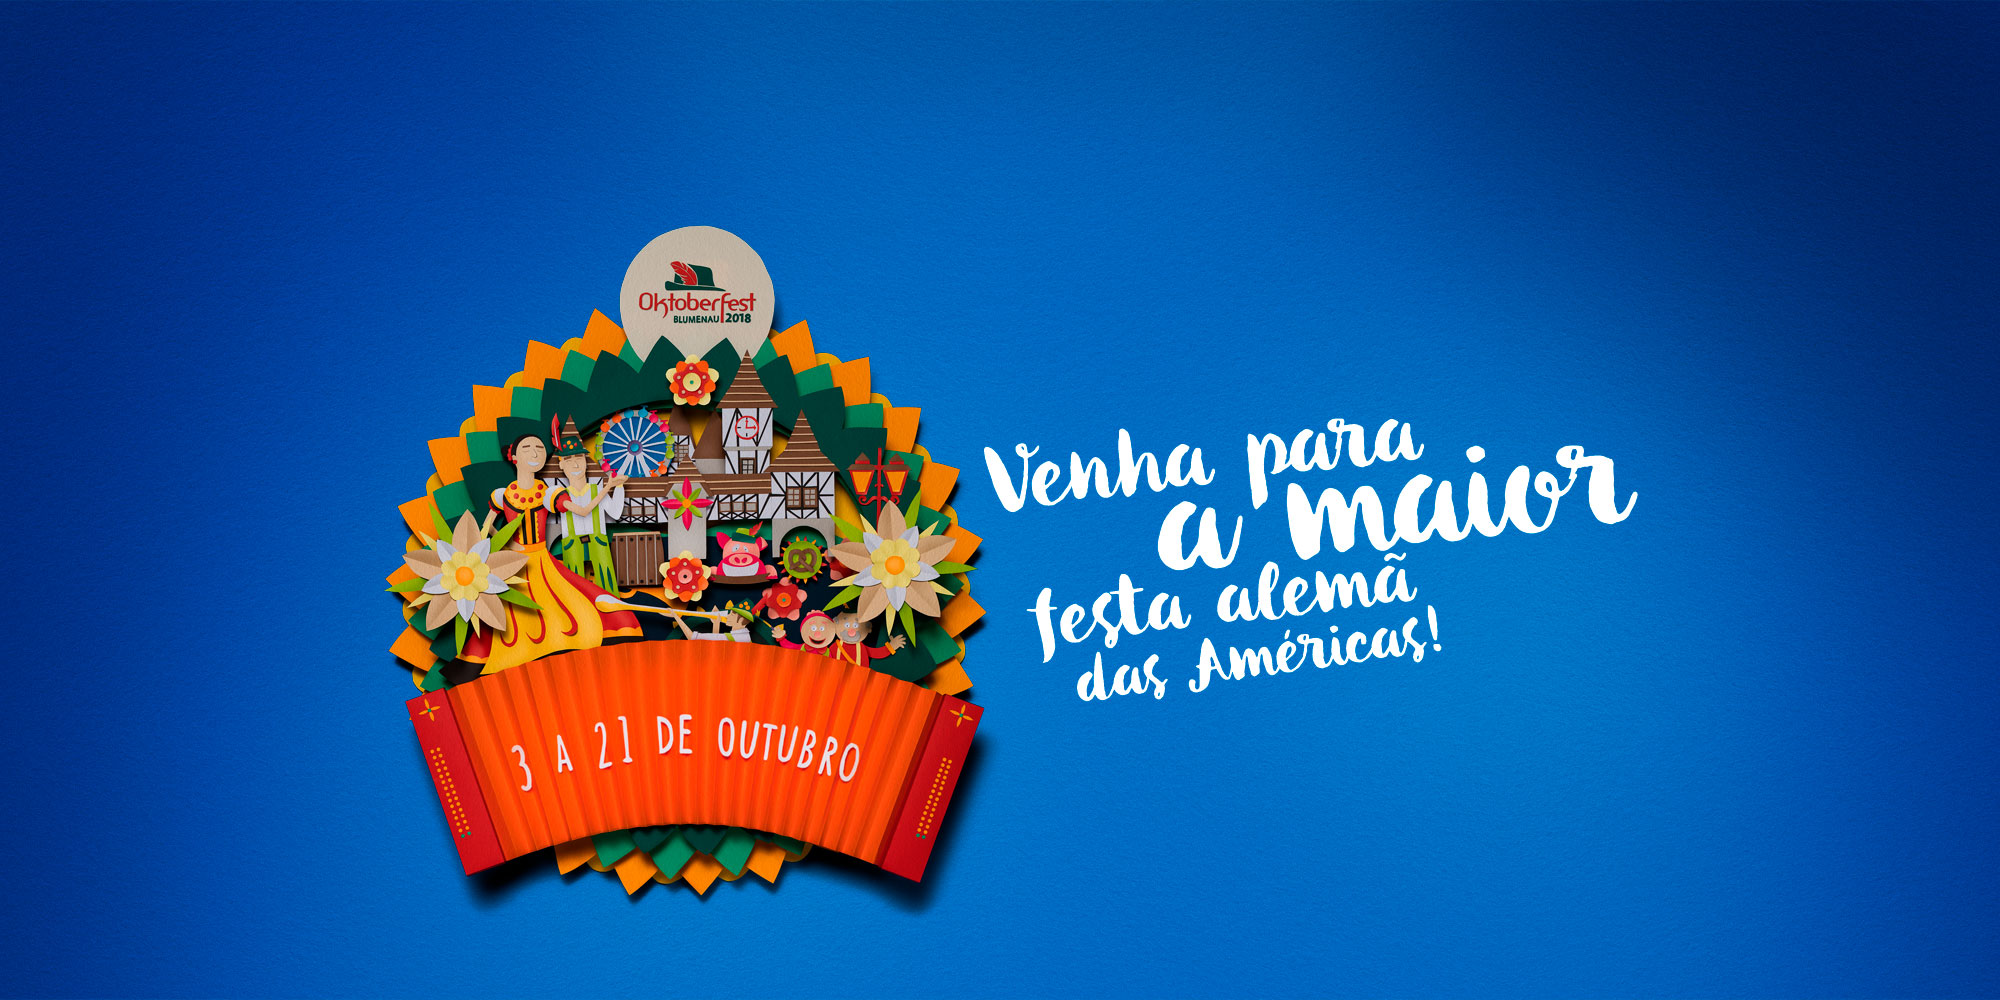 Festas de Outubro em Santa Catarina Oktoberfest Blumenau